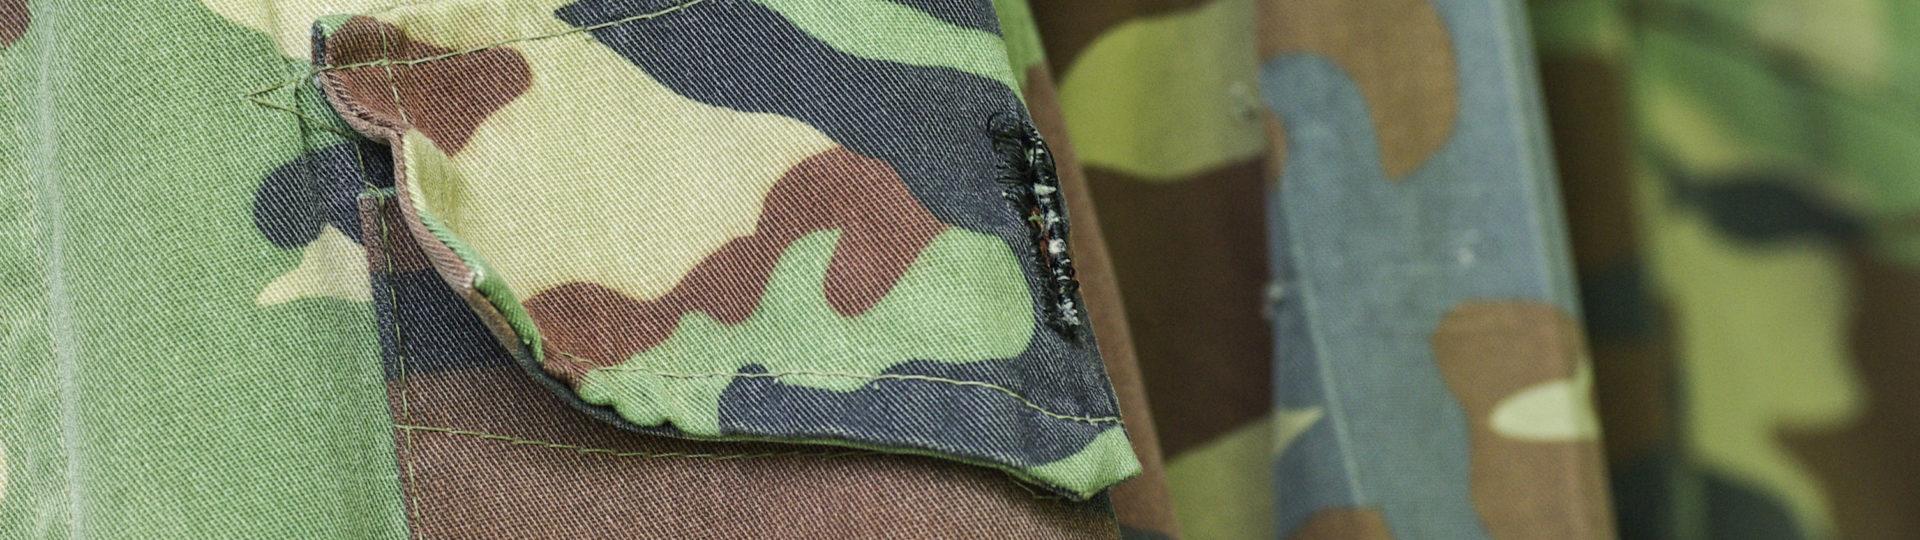 Military uniform fabric